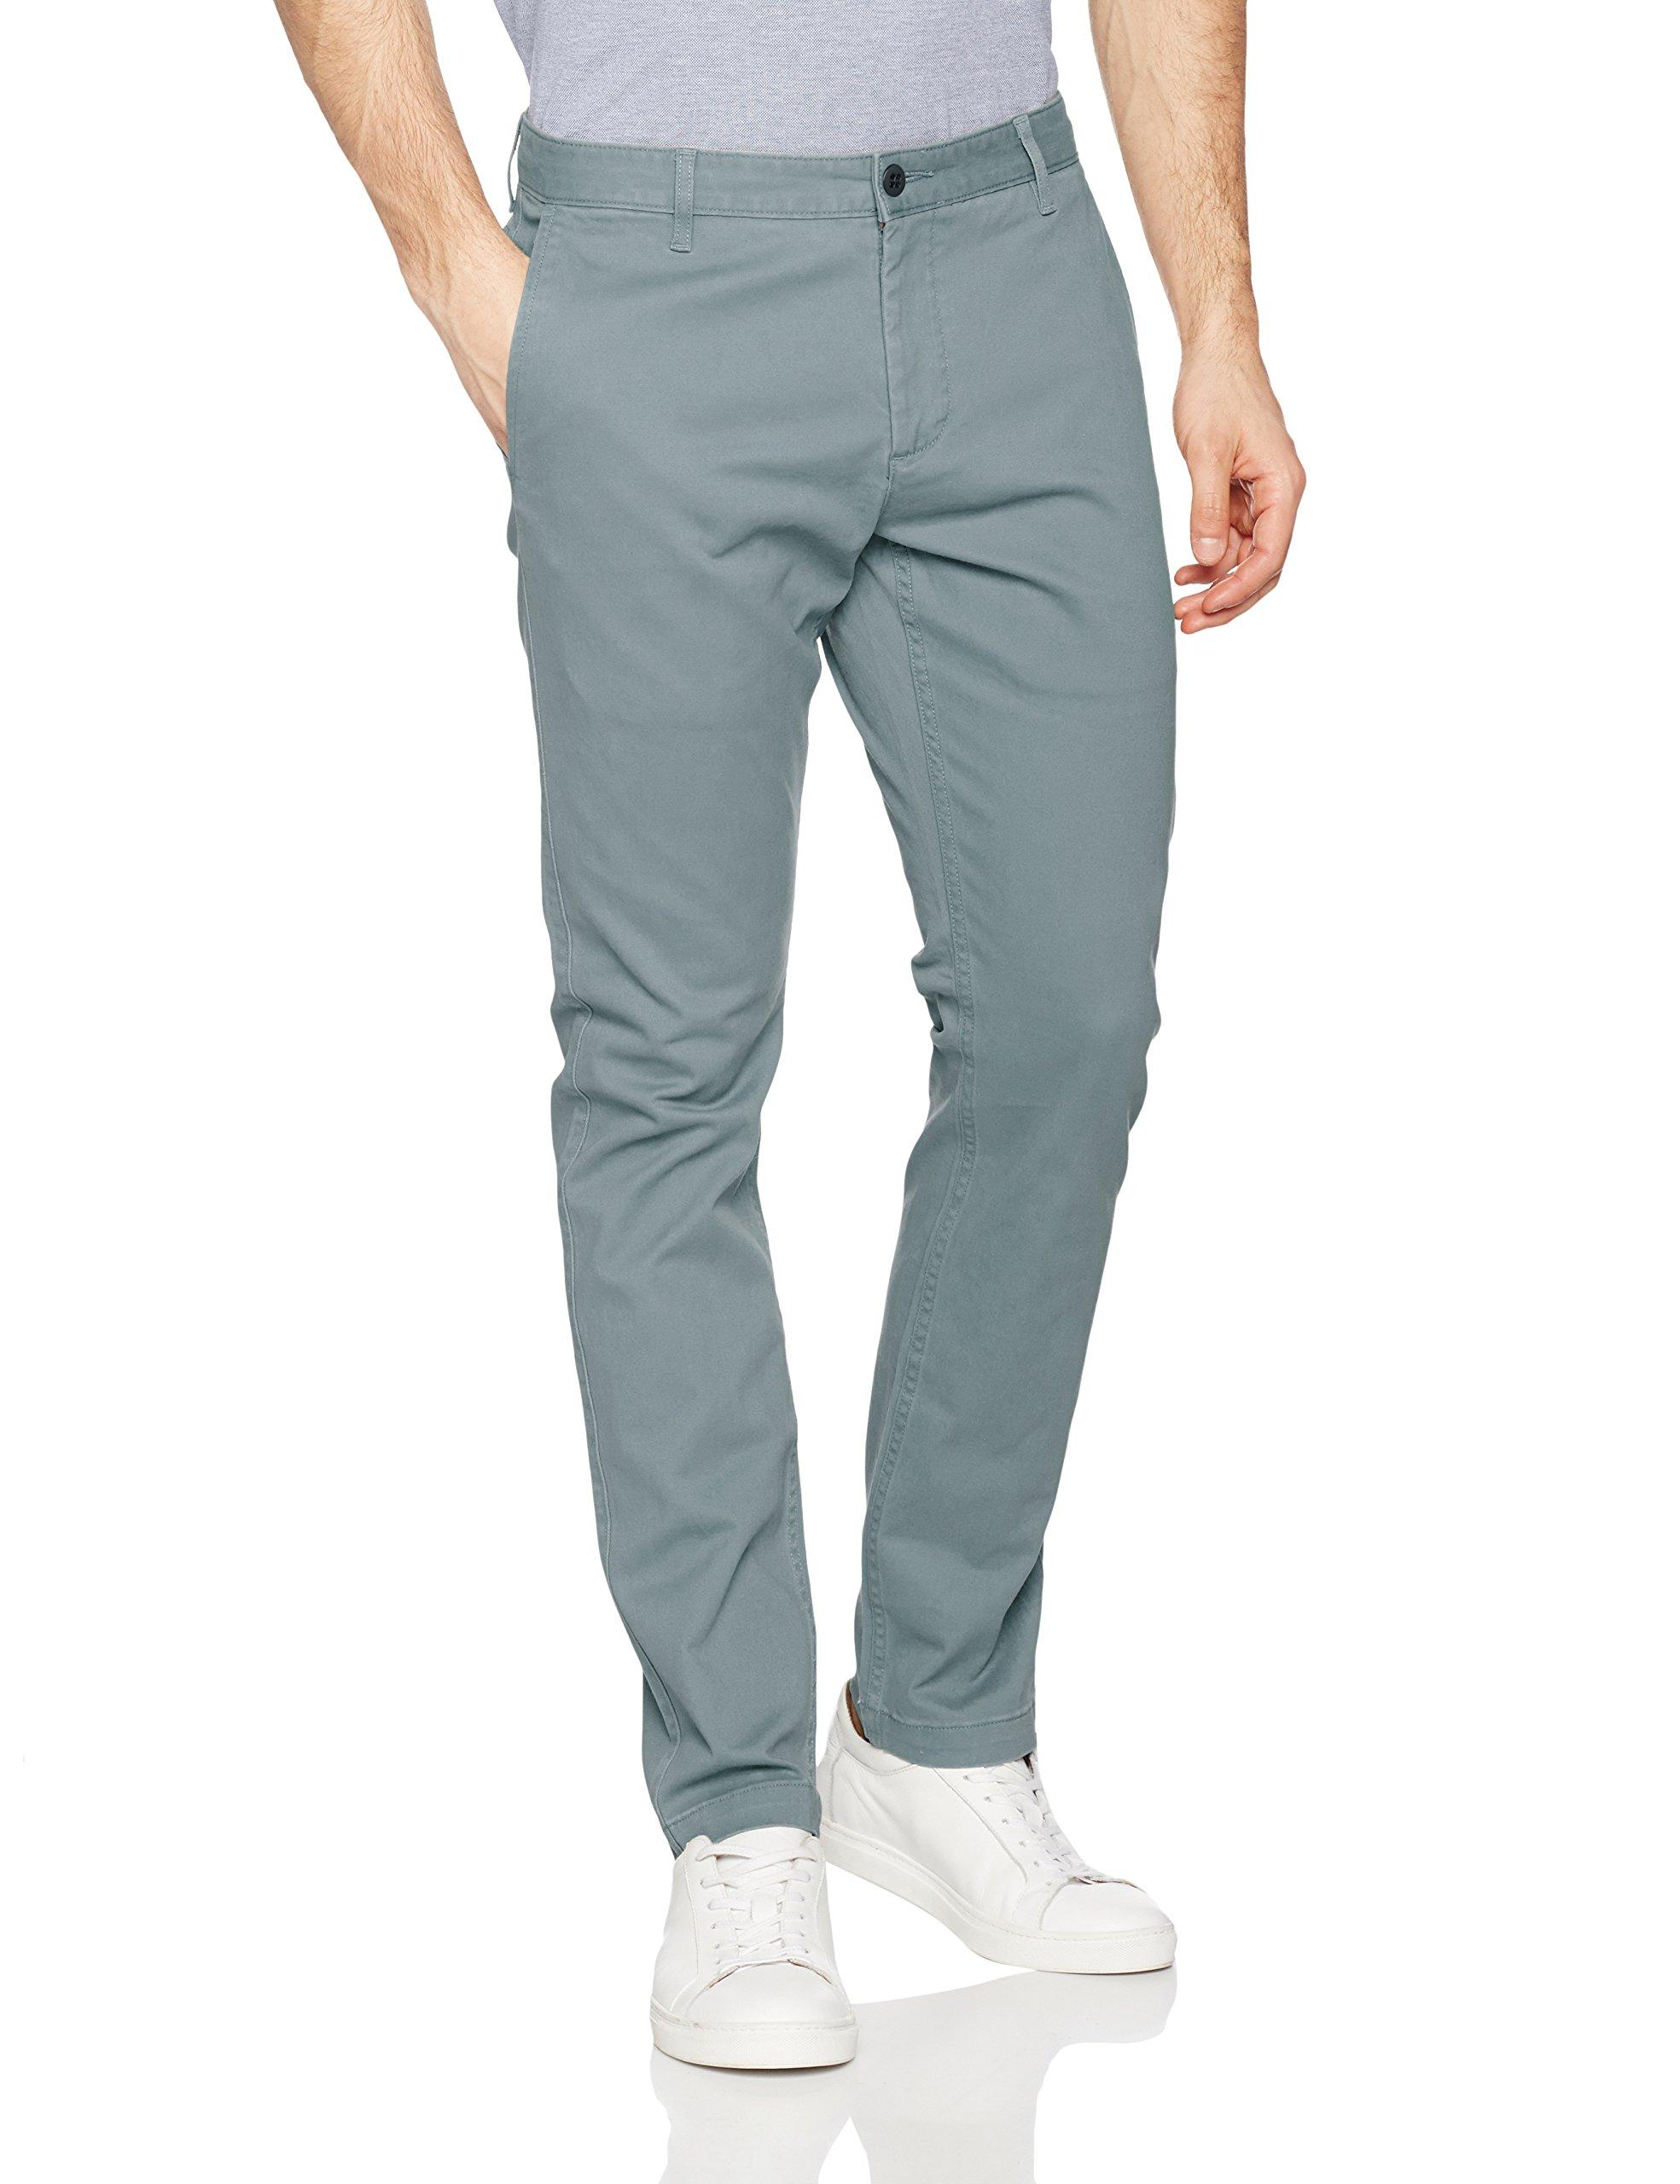 Ofertas Dockers Washed Khaki Skinny Stretch Twill Pantalones Para Hombre Moda Ofertastop